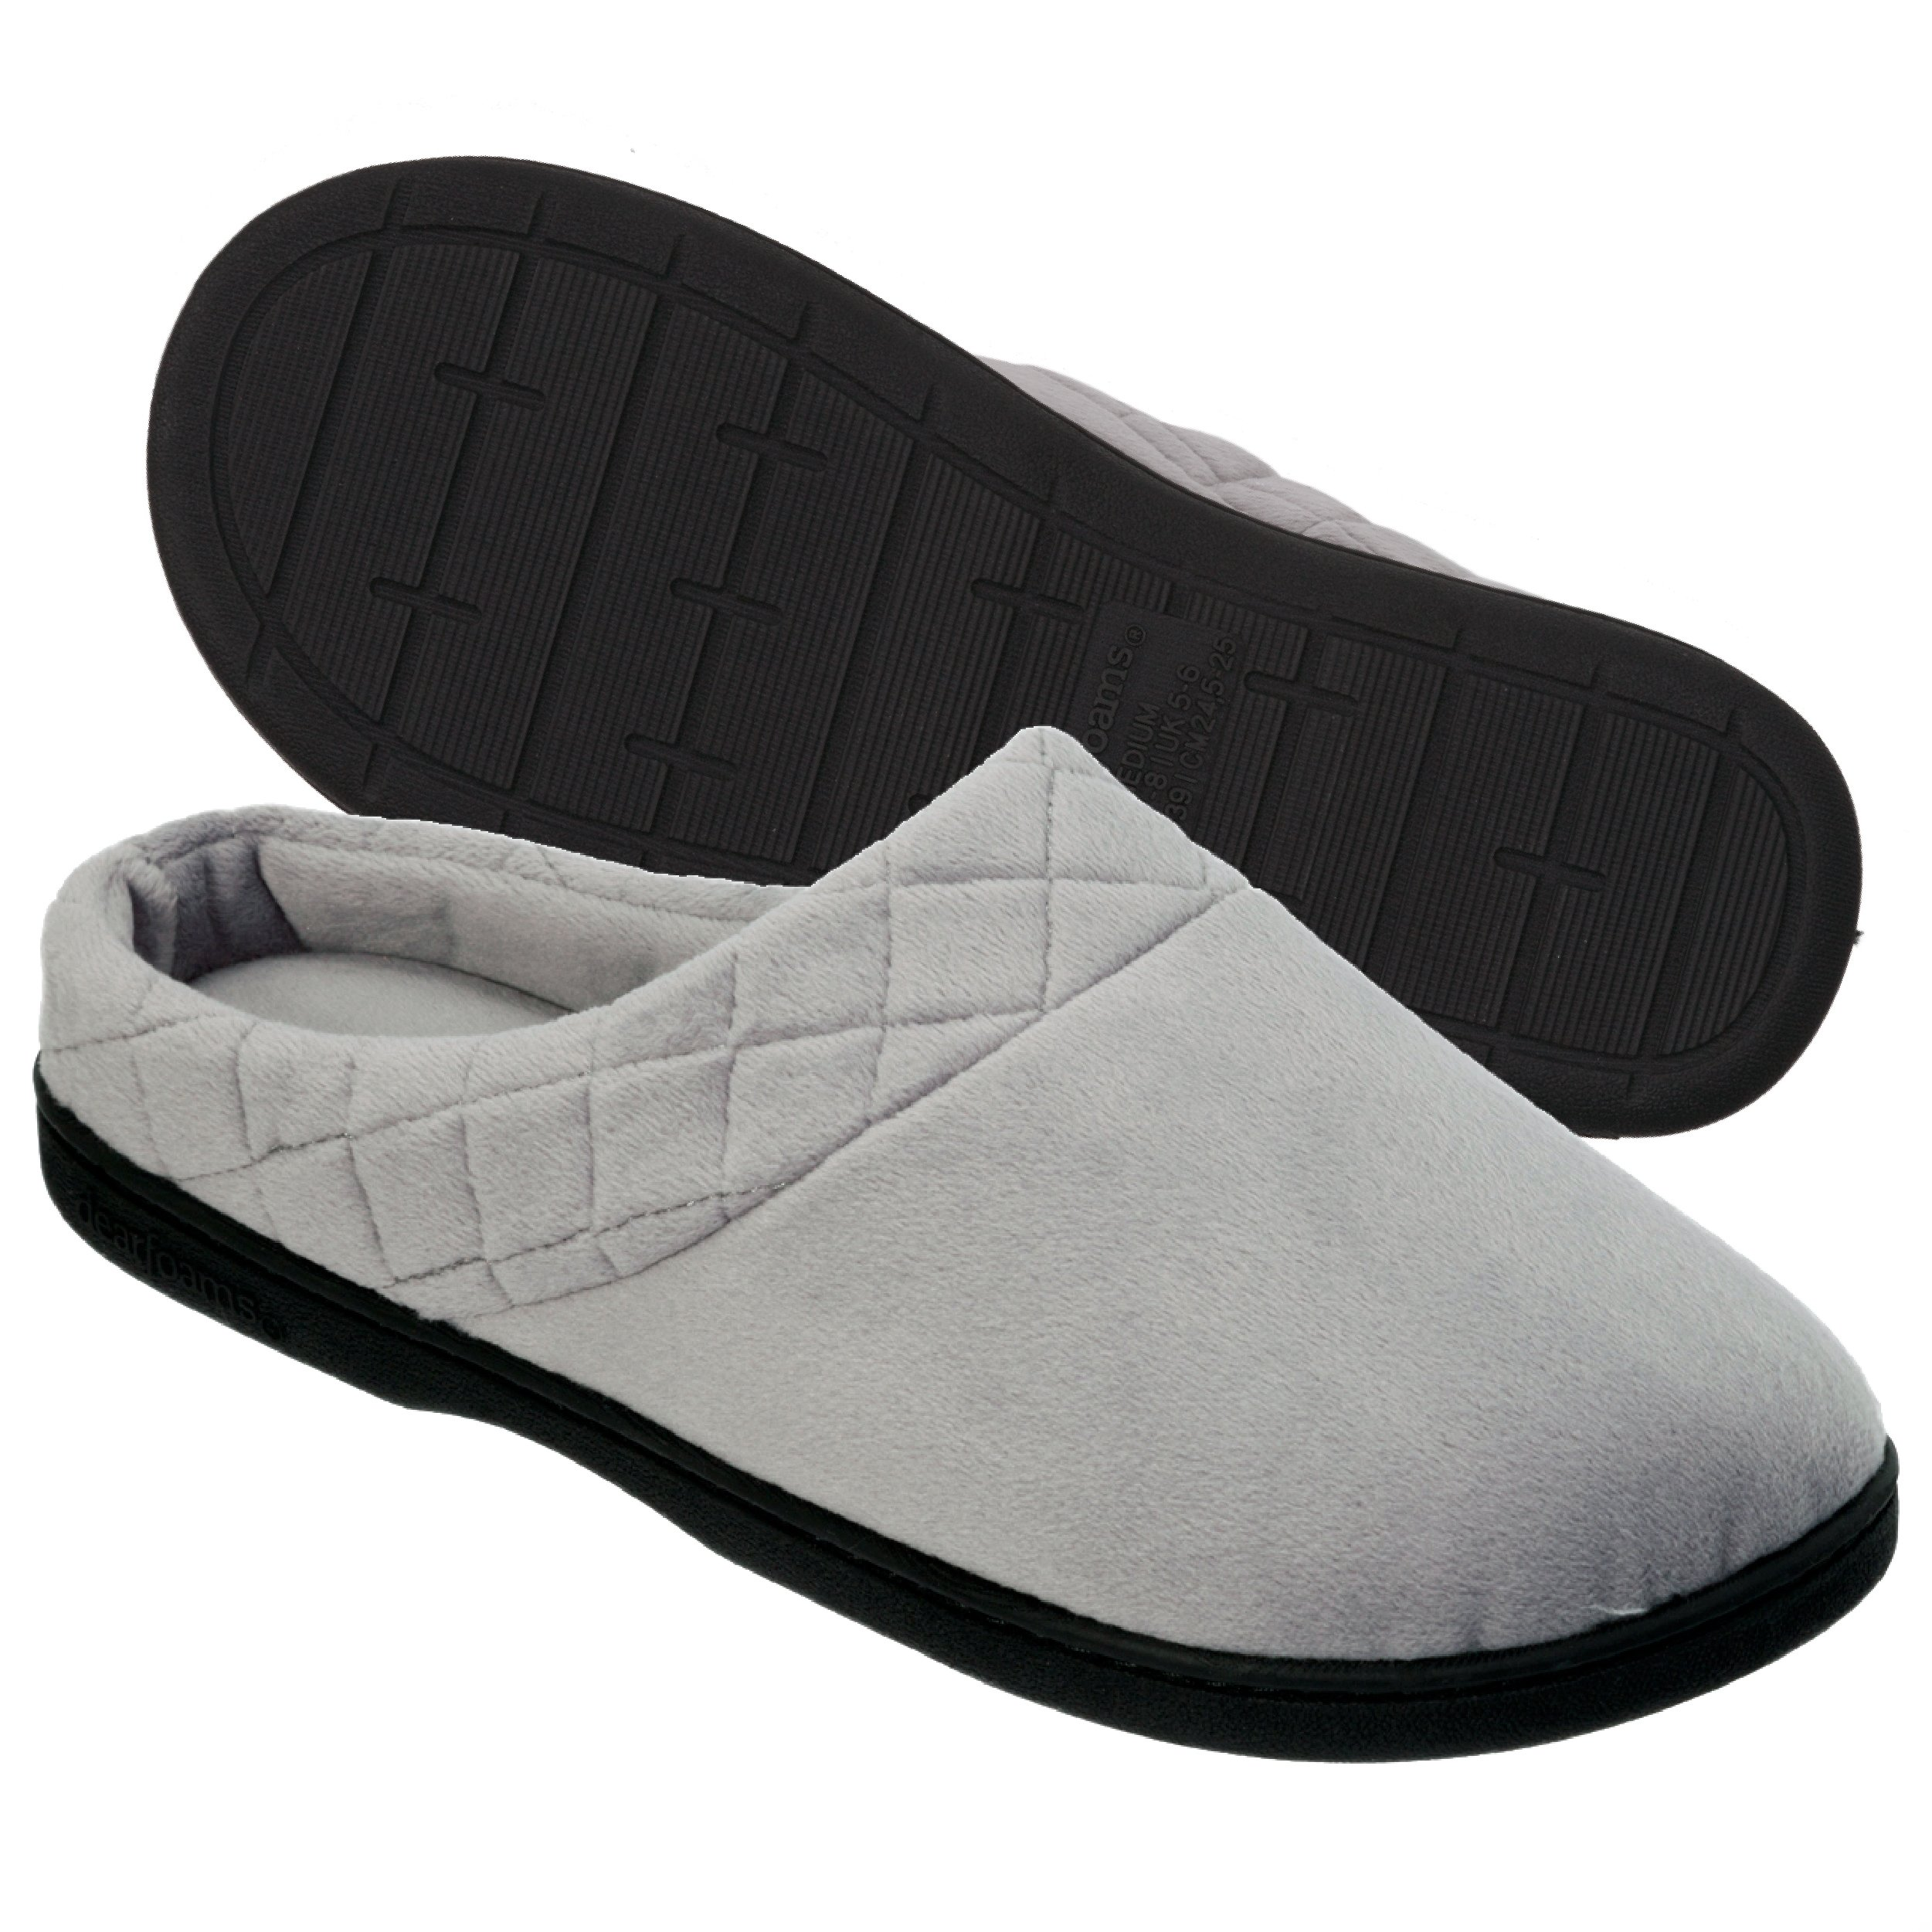 Dearfoams Women's Microfiber Clog Slipper with Quilted Cuff,Medium Grey,Large/9-10 M US by Dearfoams